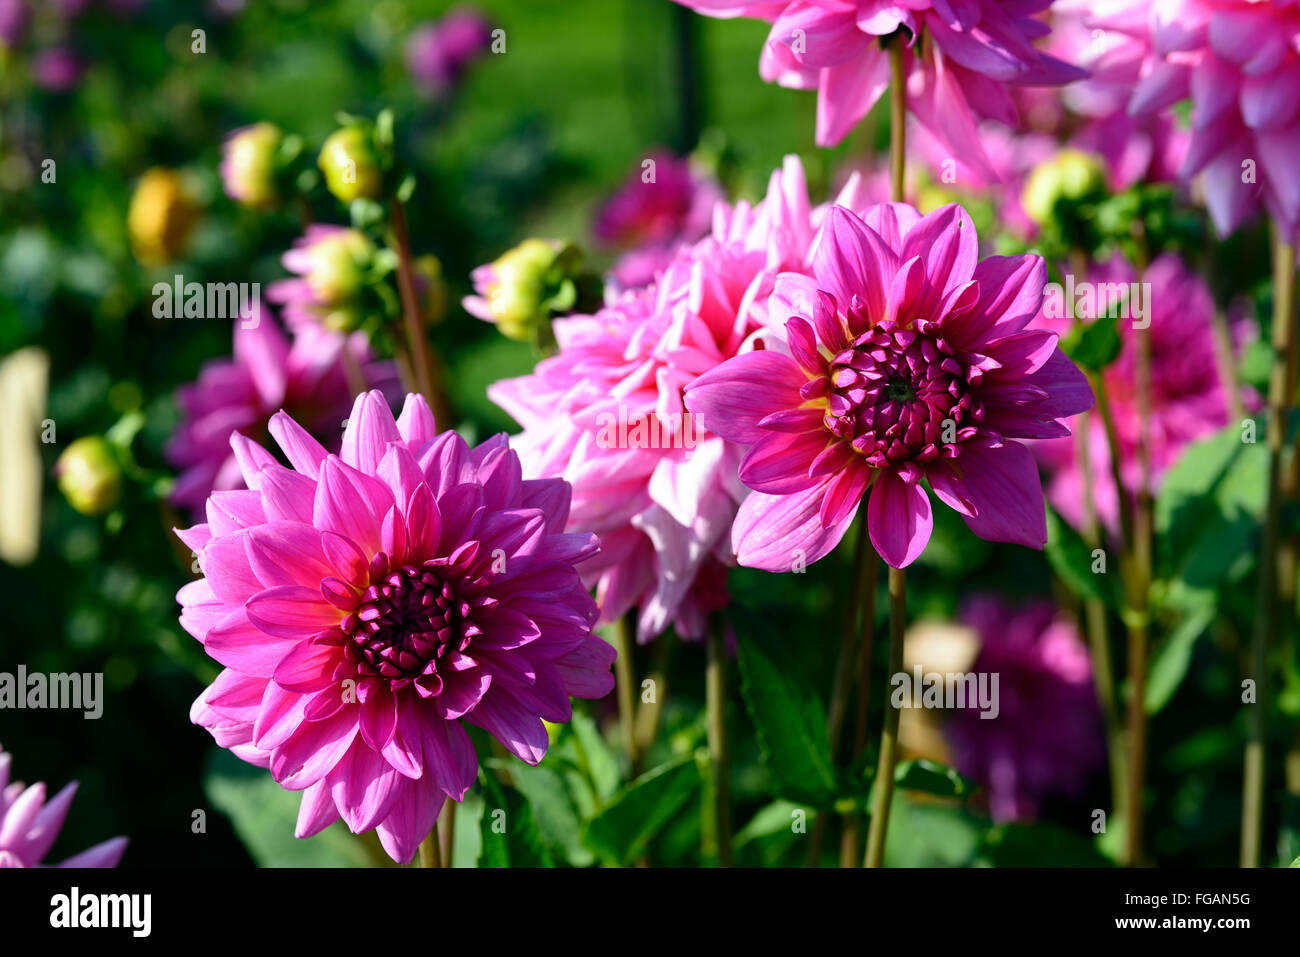 Dahlia Rosella Pink Dinner Plate Dahlias Flower Flowers Bloom